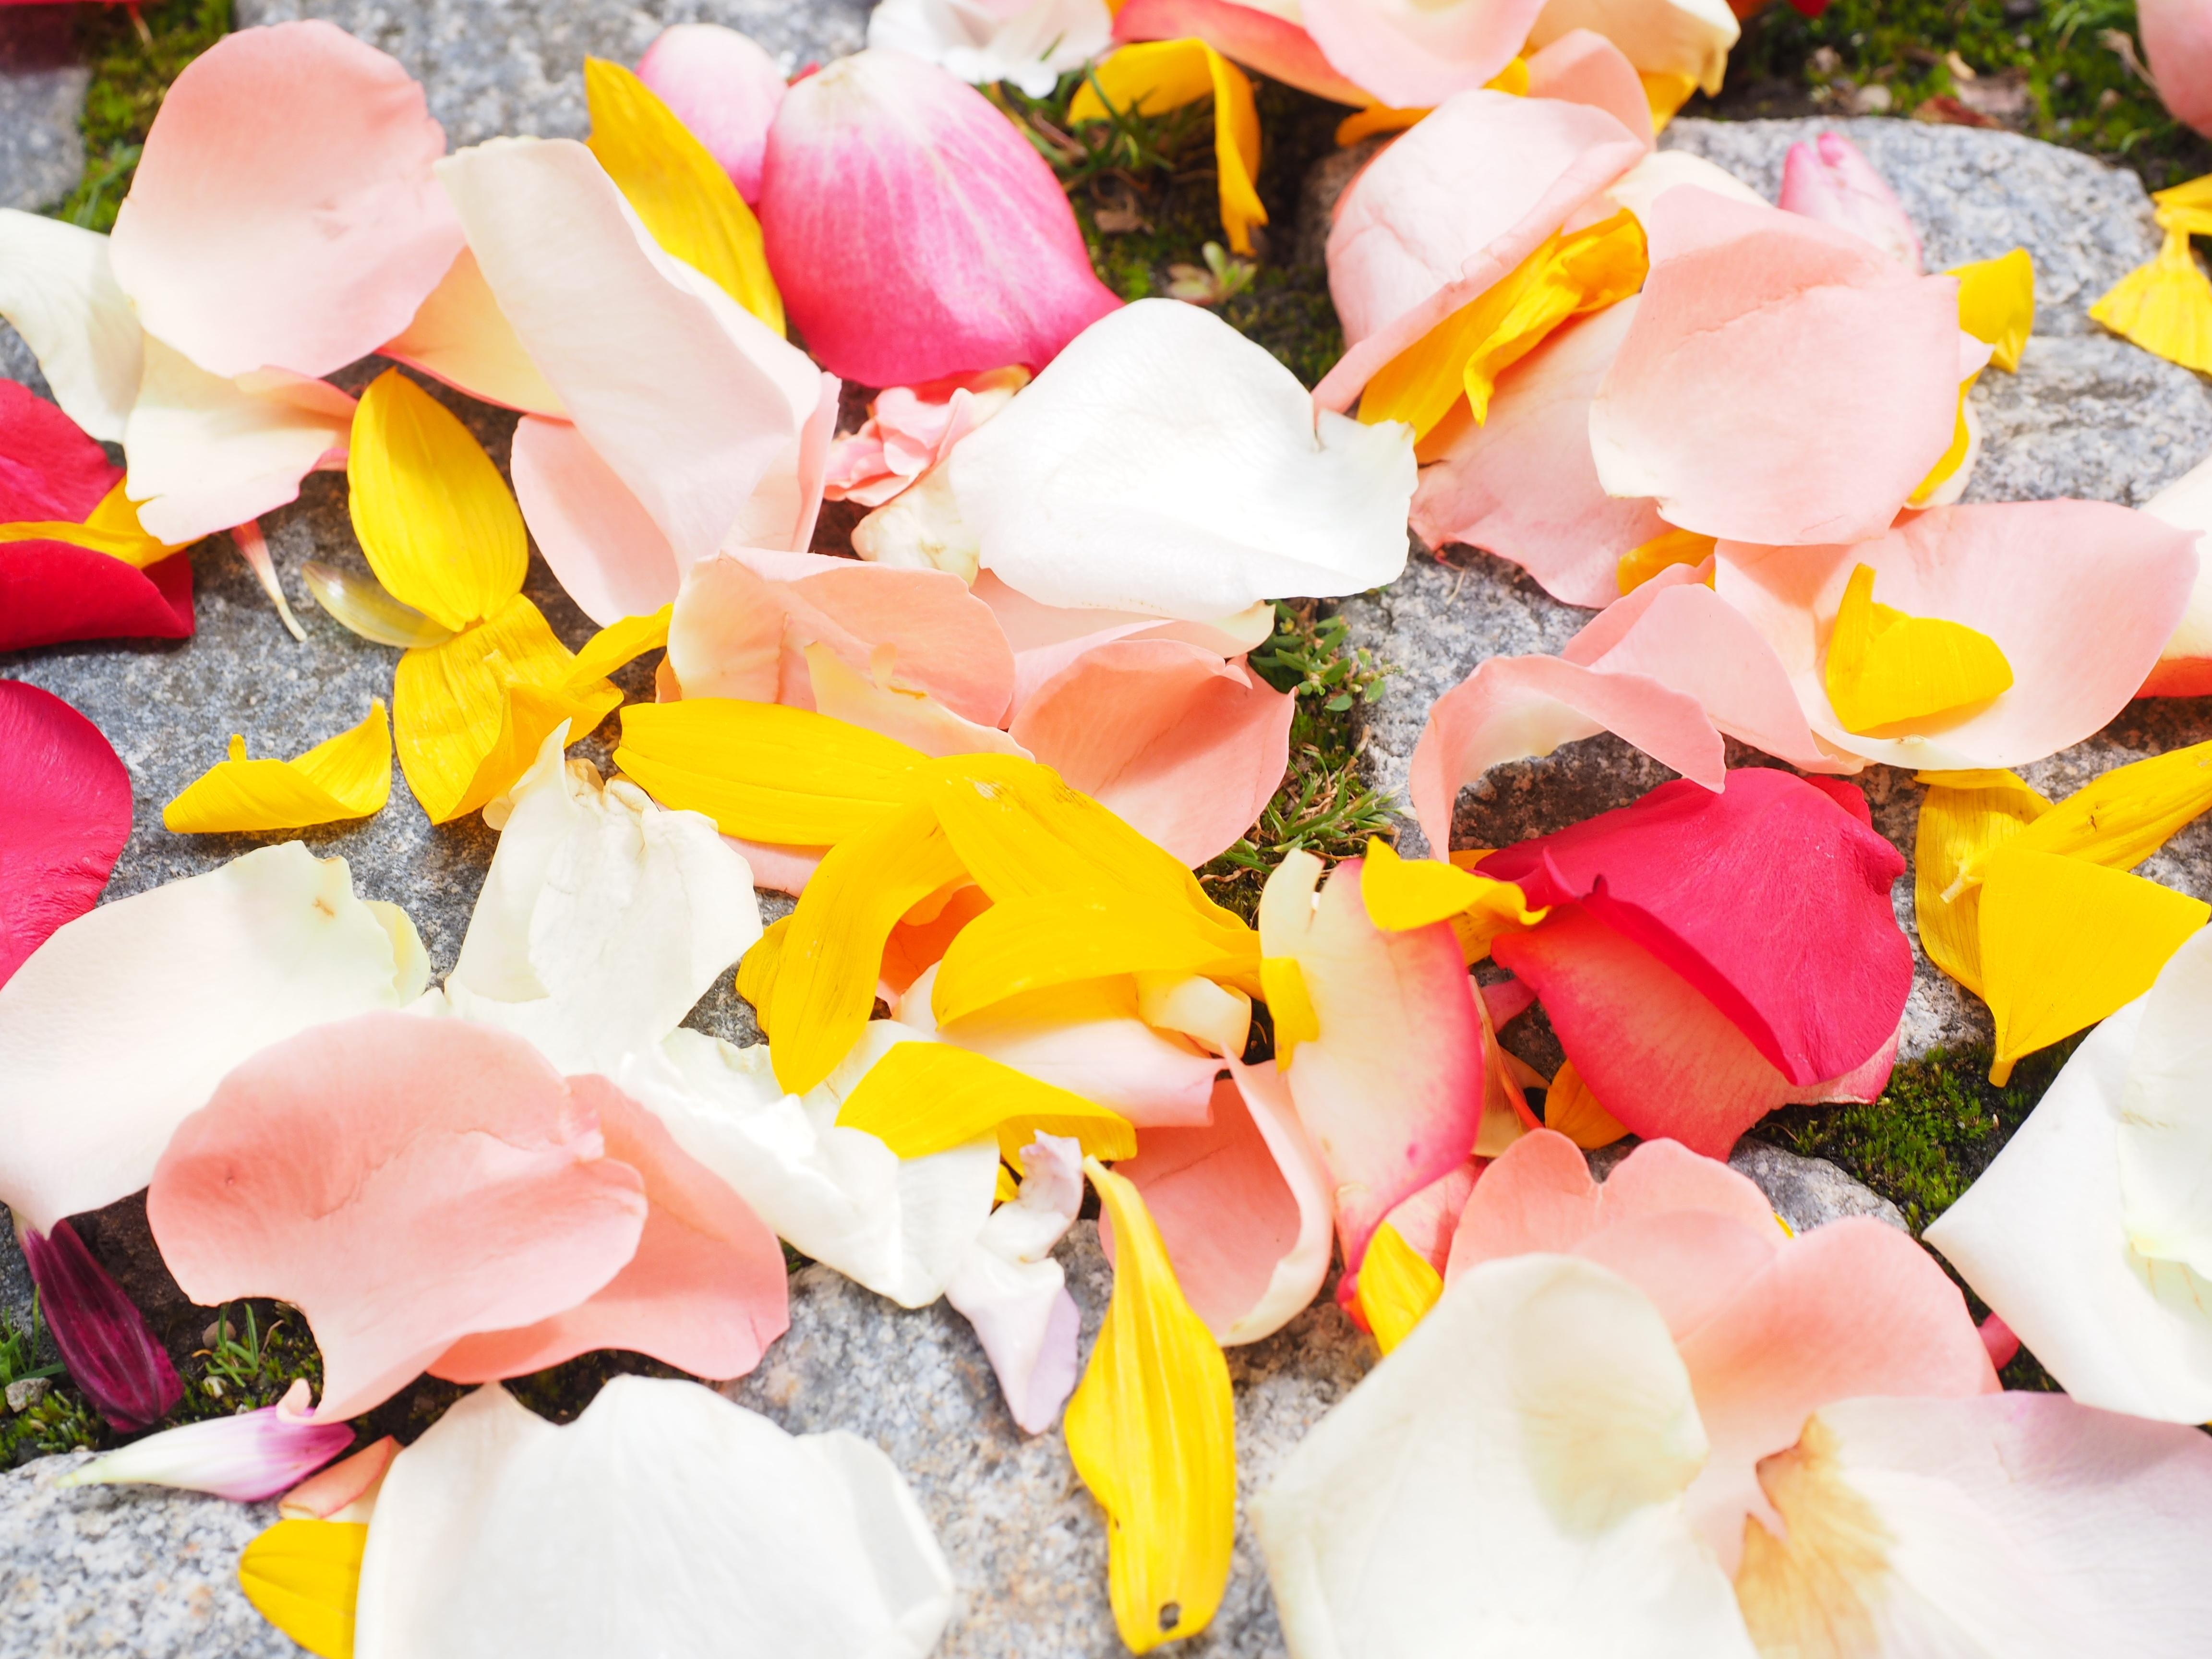 Free Images Blossom White Leaf Petal Love Spring Red Color